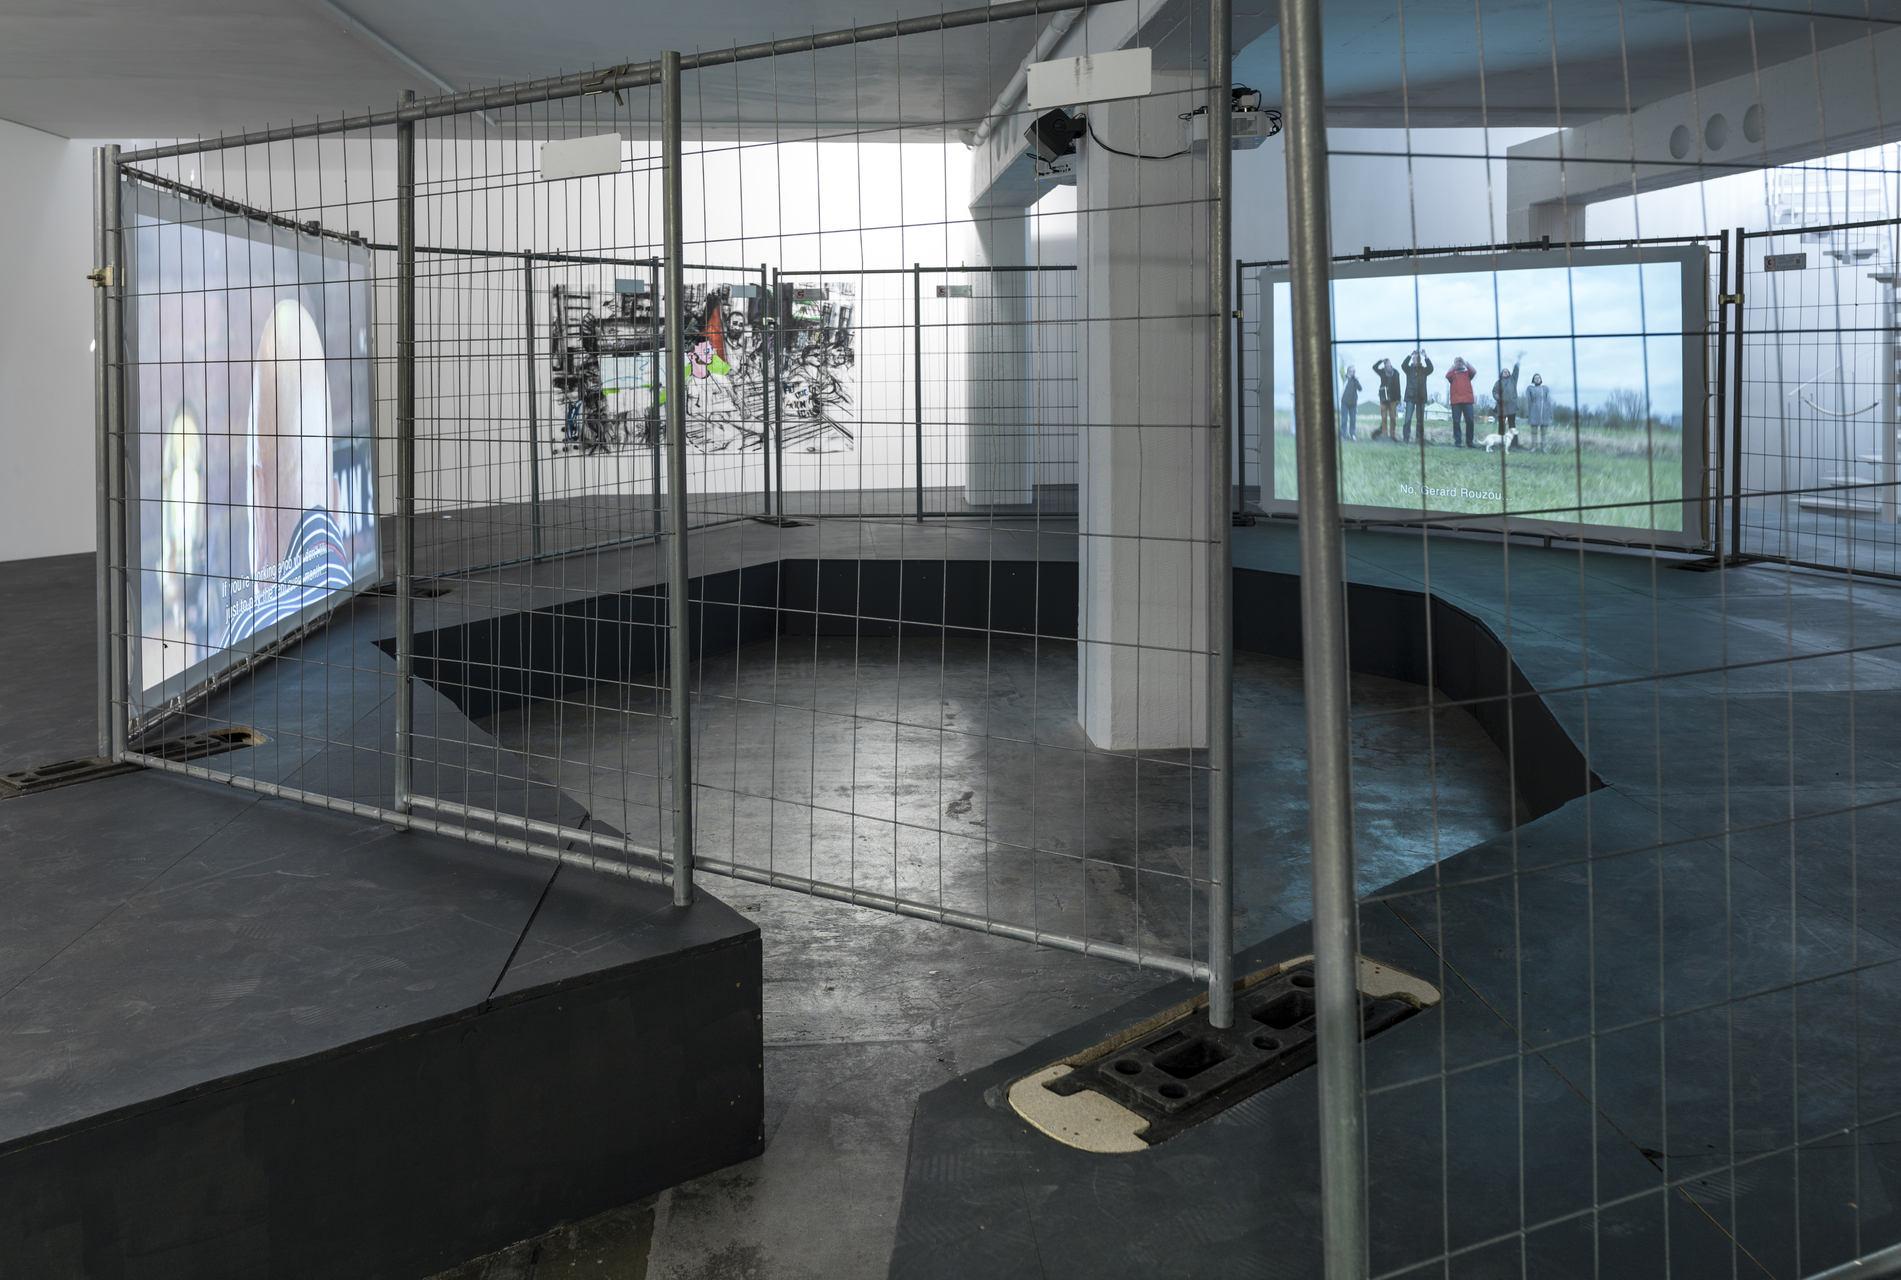 Erik van Lieshout_Dog_Galerie Guido W. Baudach_I 15